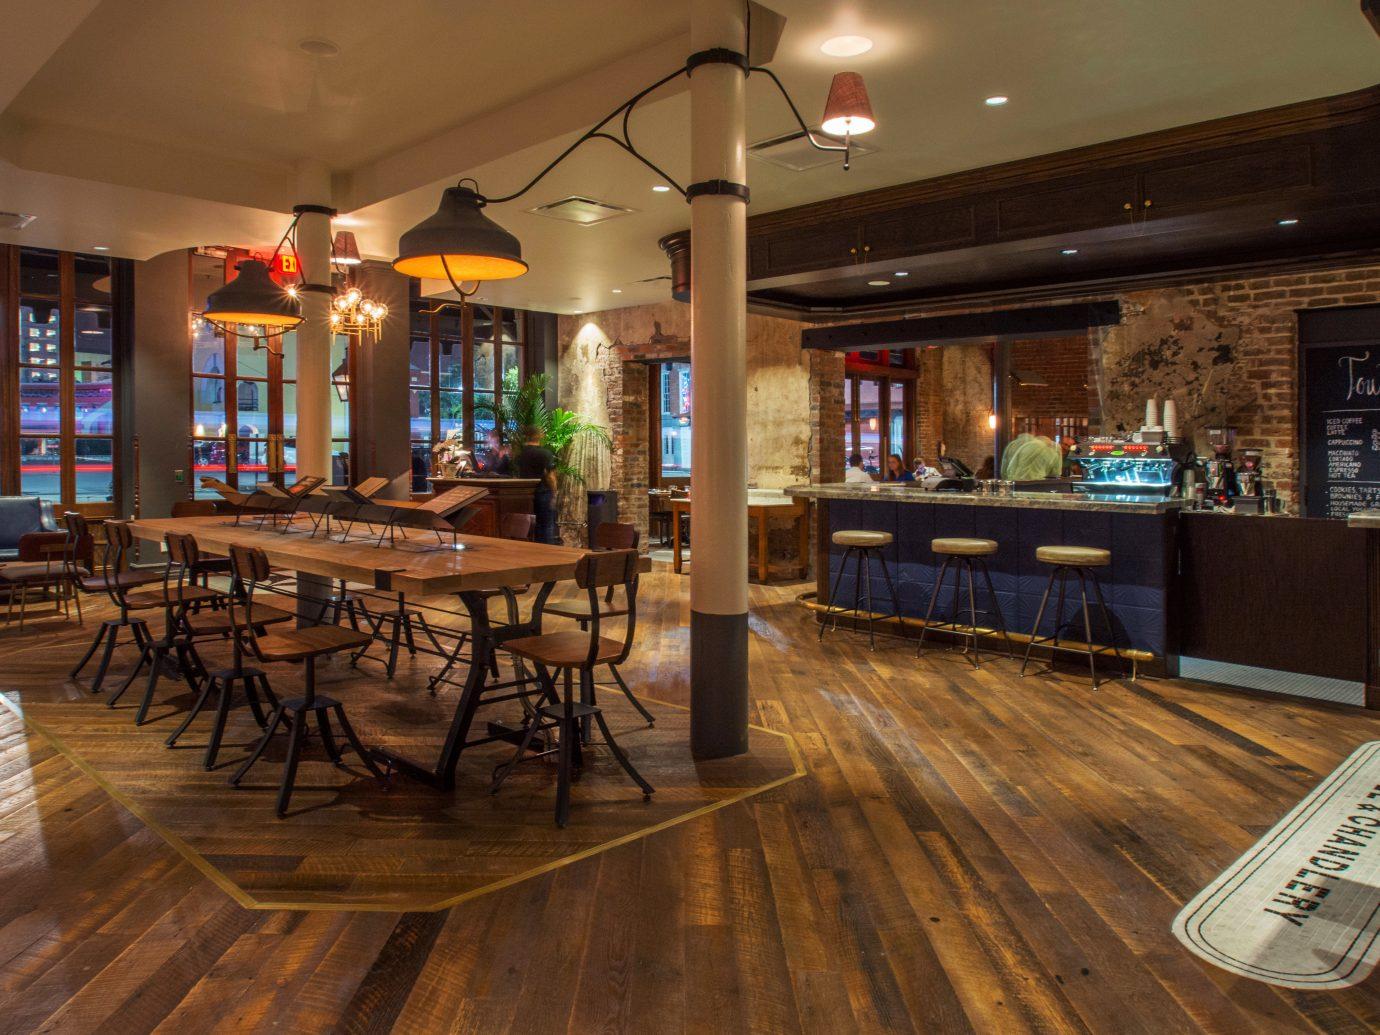 Bar Dining Drink Eat Luxury Trip Ideas floor indoor ceiling recreation room Lobby room billiard room estate home interior design wood real estate restaurant flooring furniture